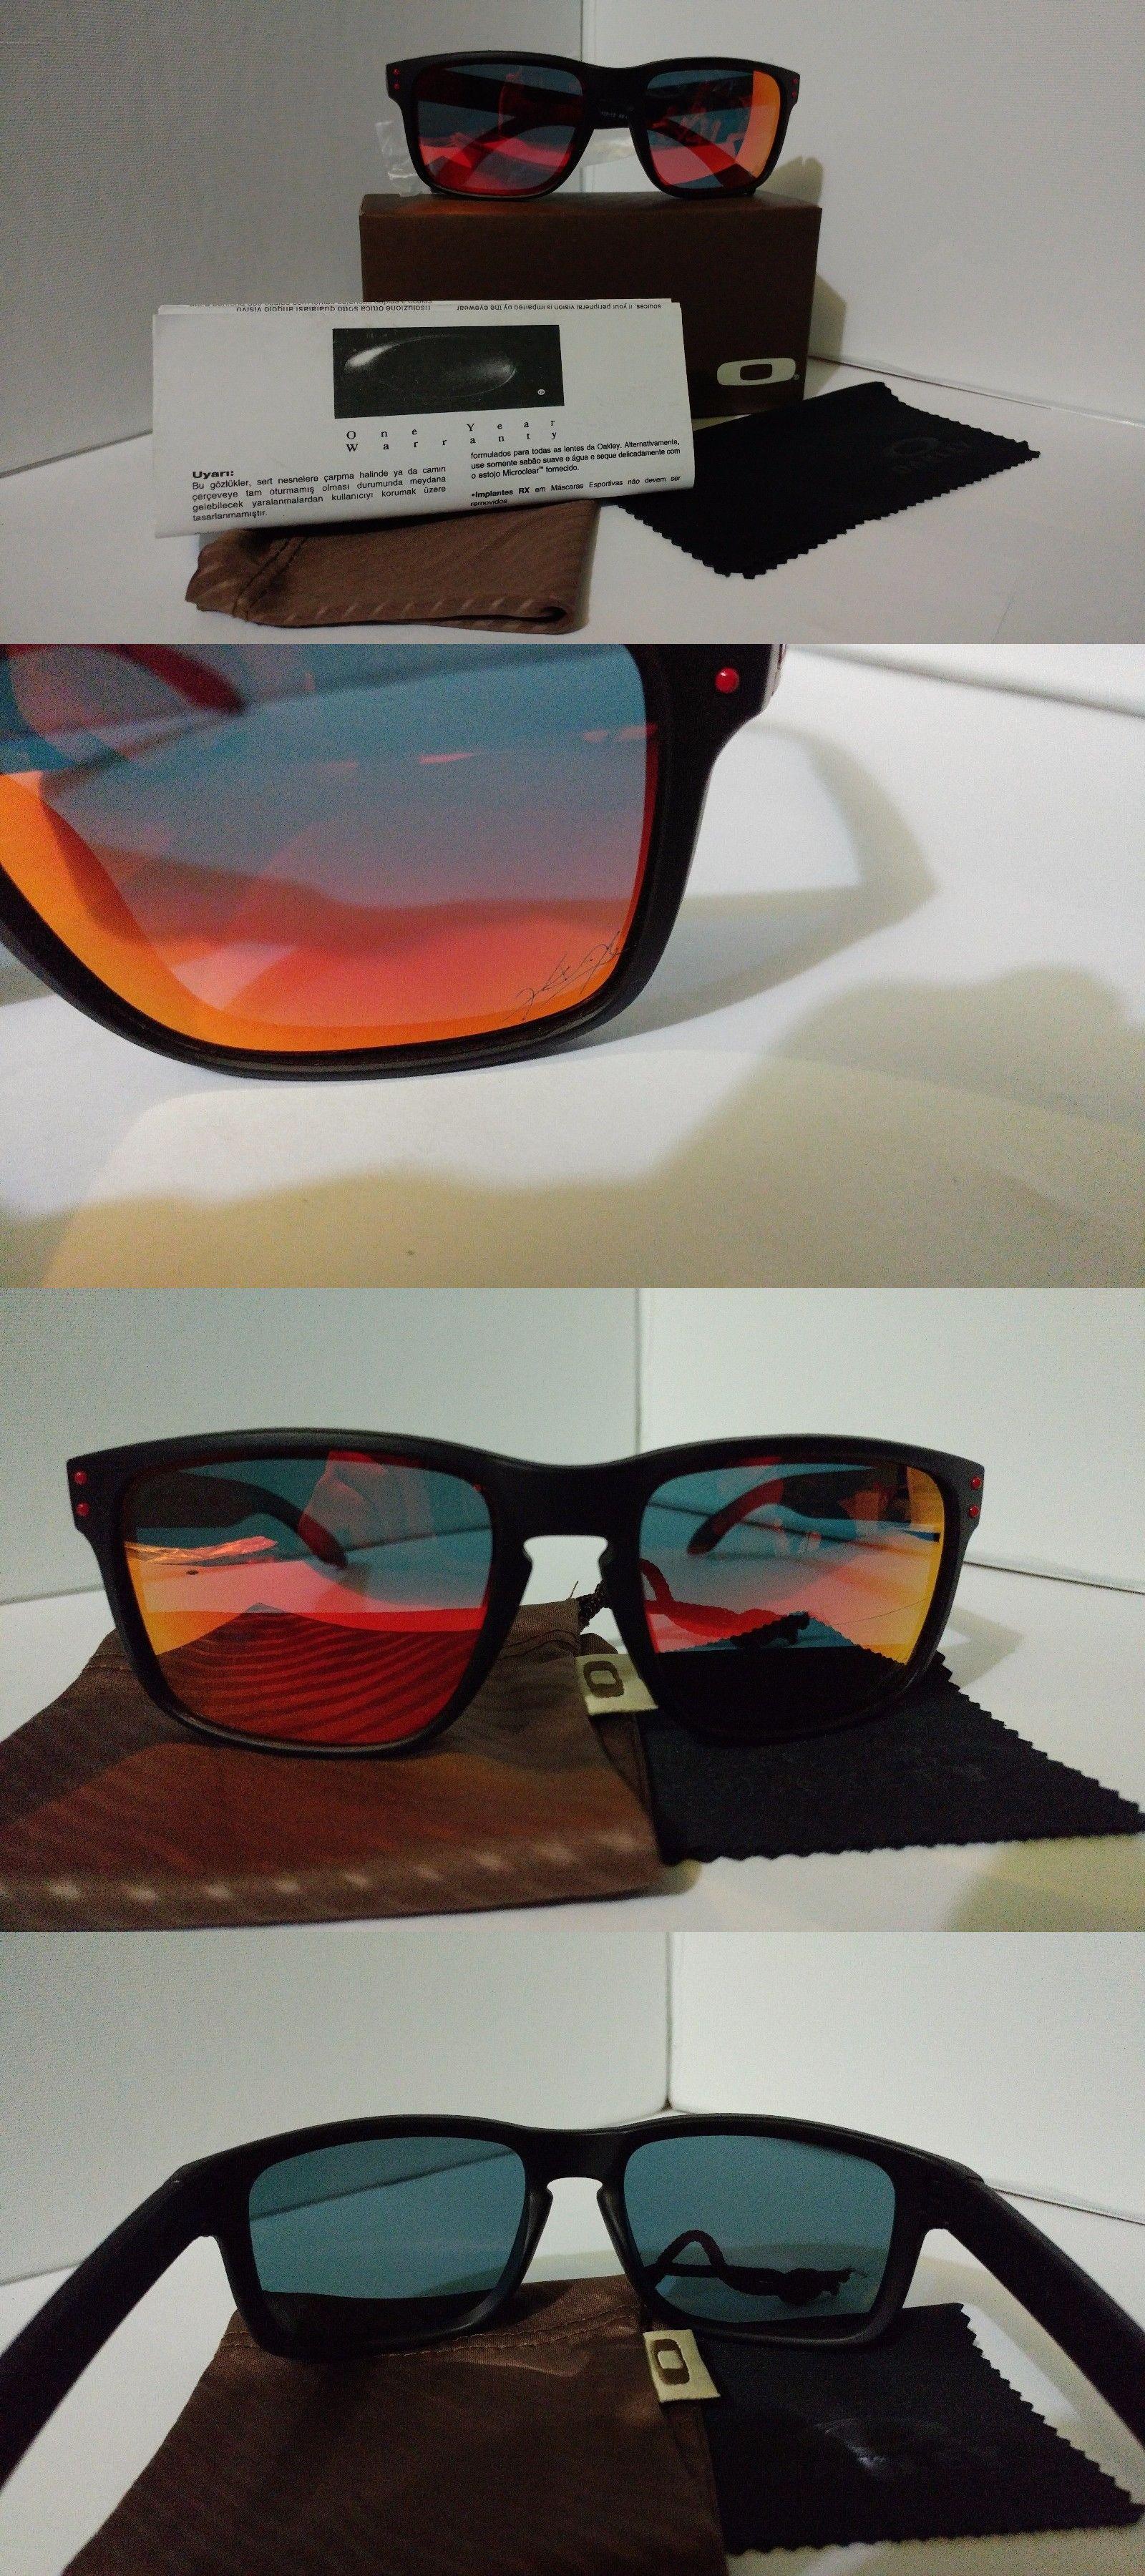 cdb0e8b6b4e2 ... coupon for sunglasses 79720 oakley holbrook oo9102 matte black frame w  55mm red polarized lens 53957